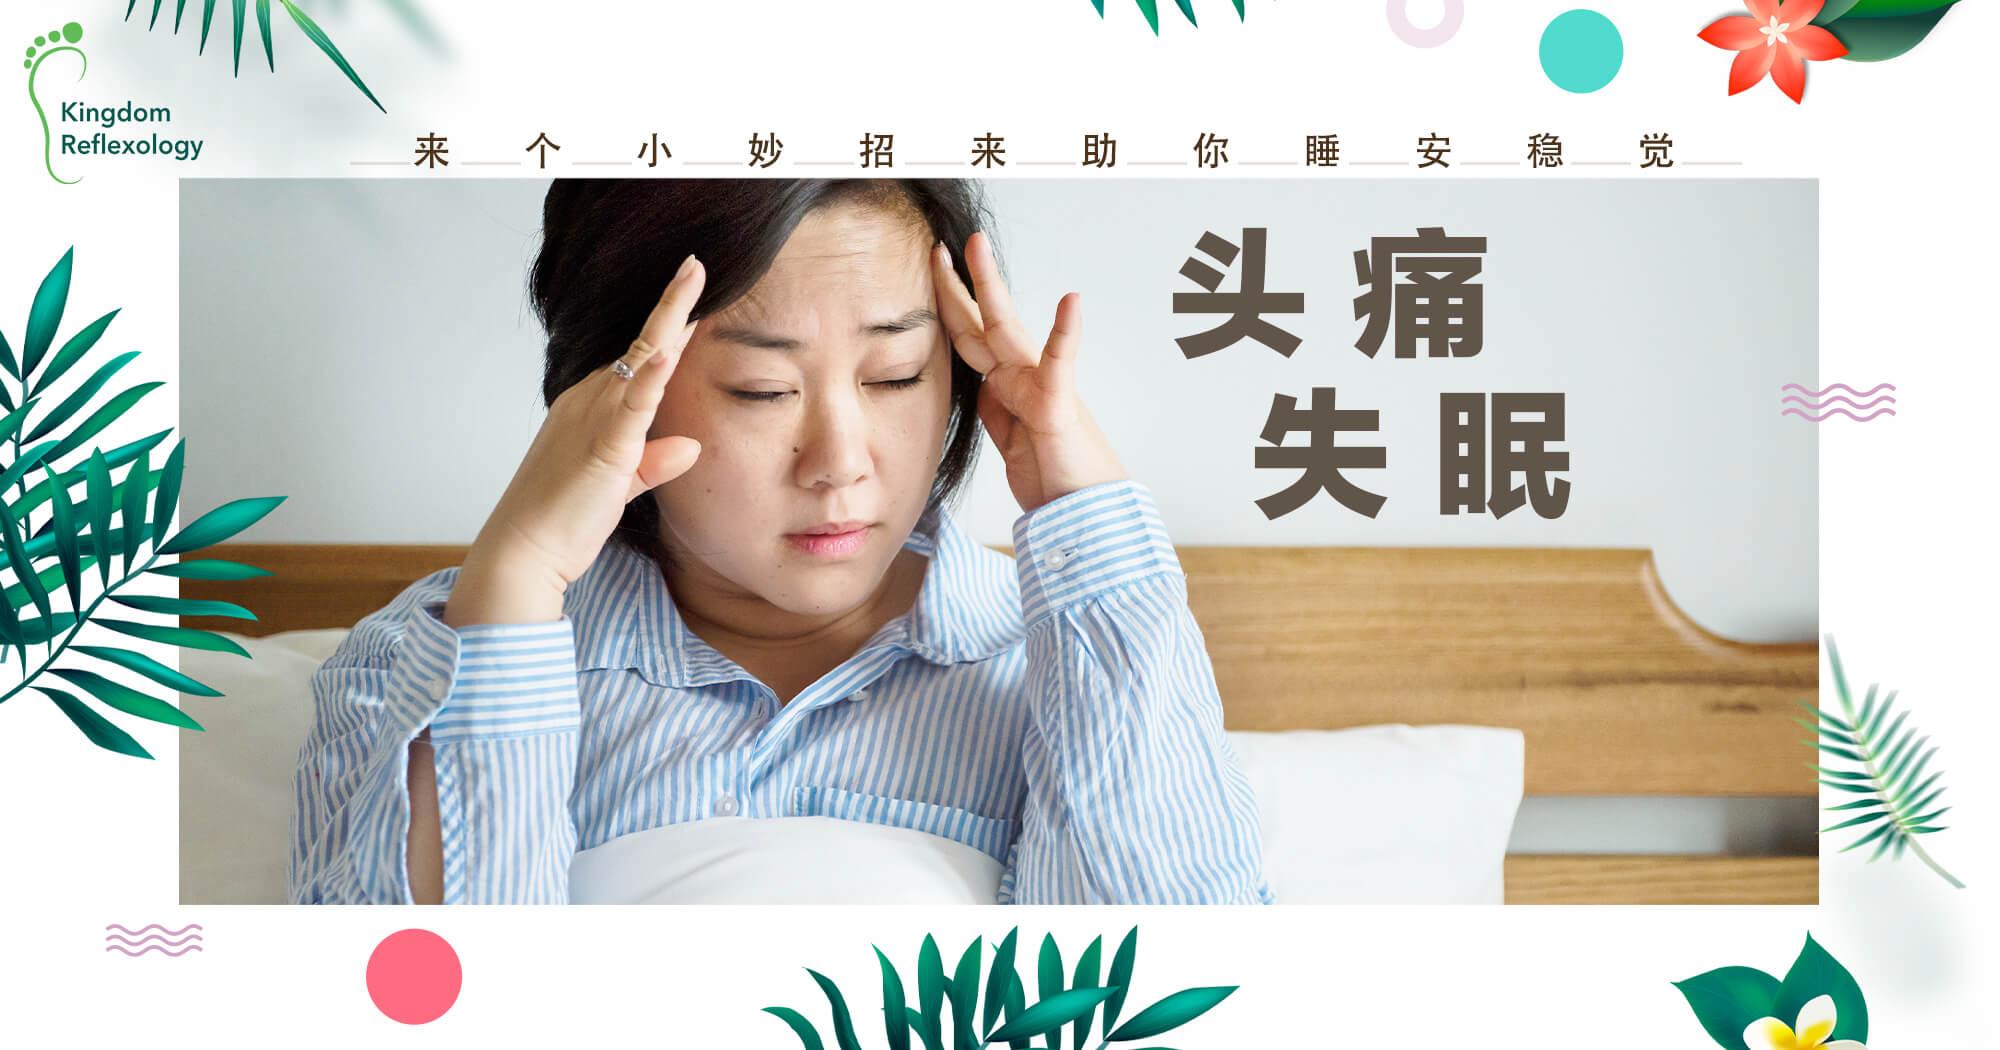 Kingdom-Reflexology-Headache & Insomnia Problem